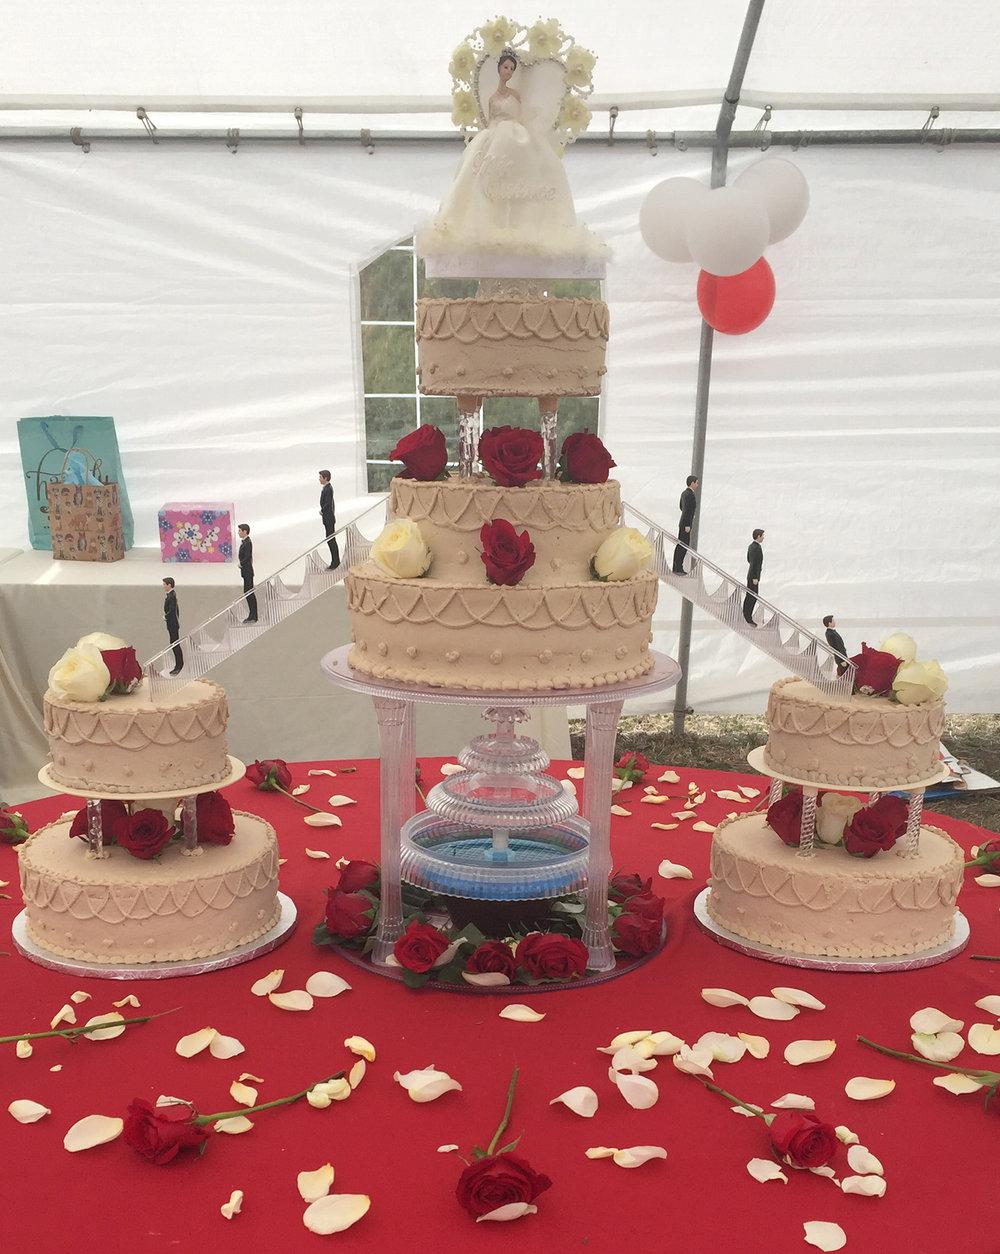 quinceanera-white-red-cake-hmb-bakery.jpg